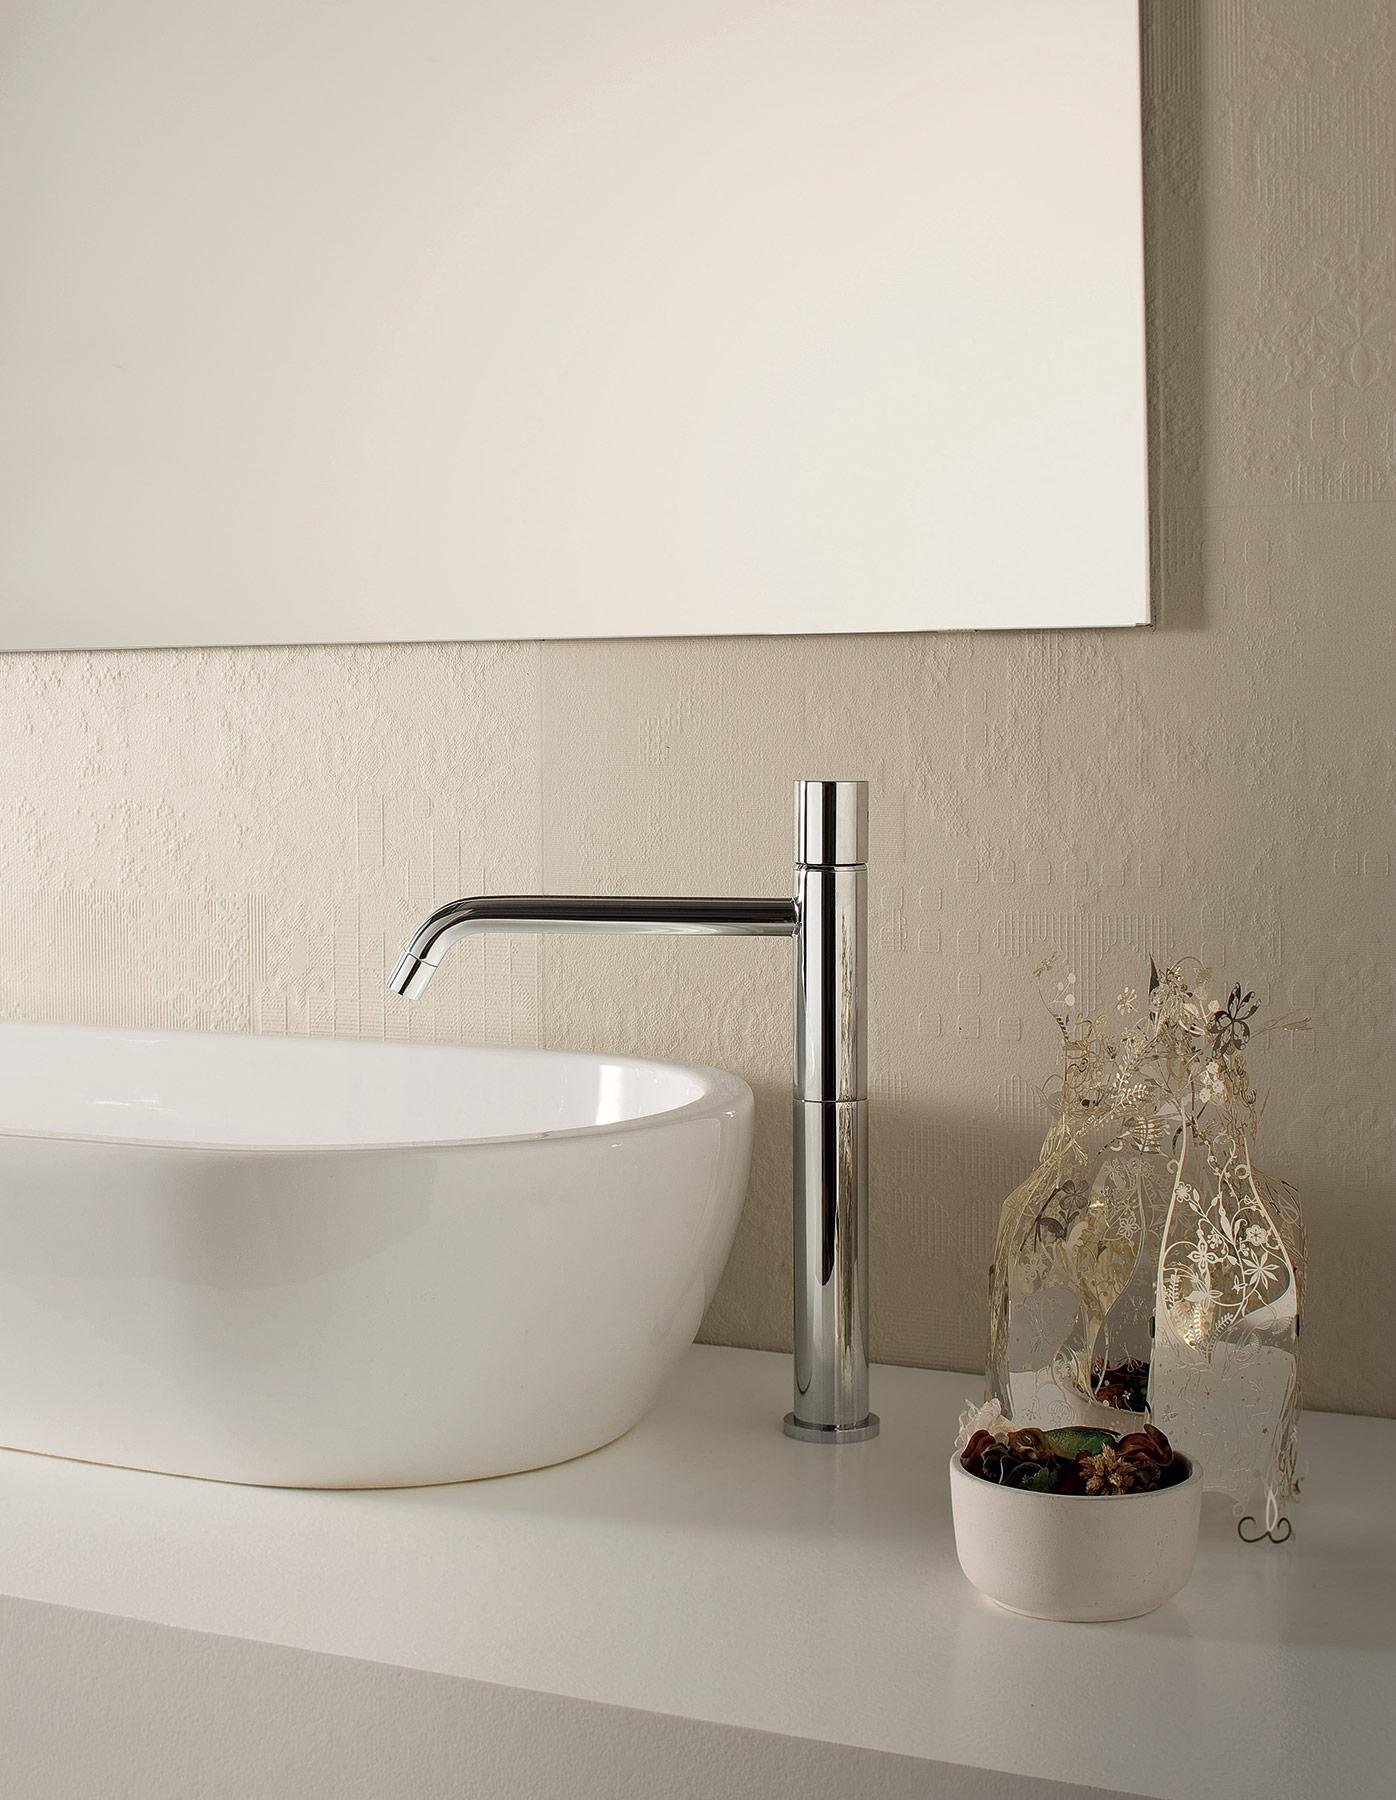 Transitional Nostromo Small Deck Mount Faucet